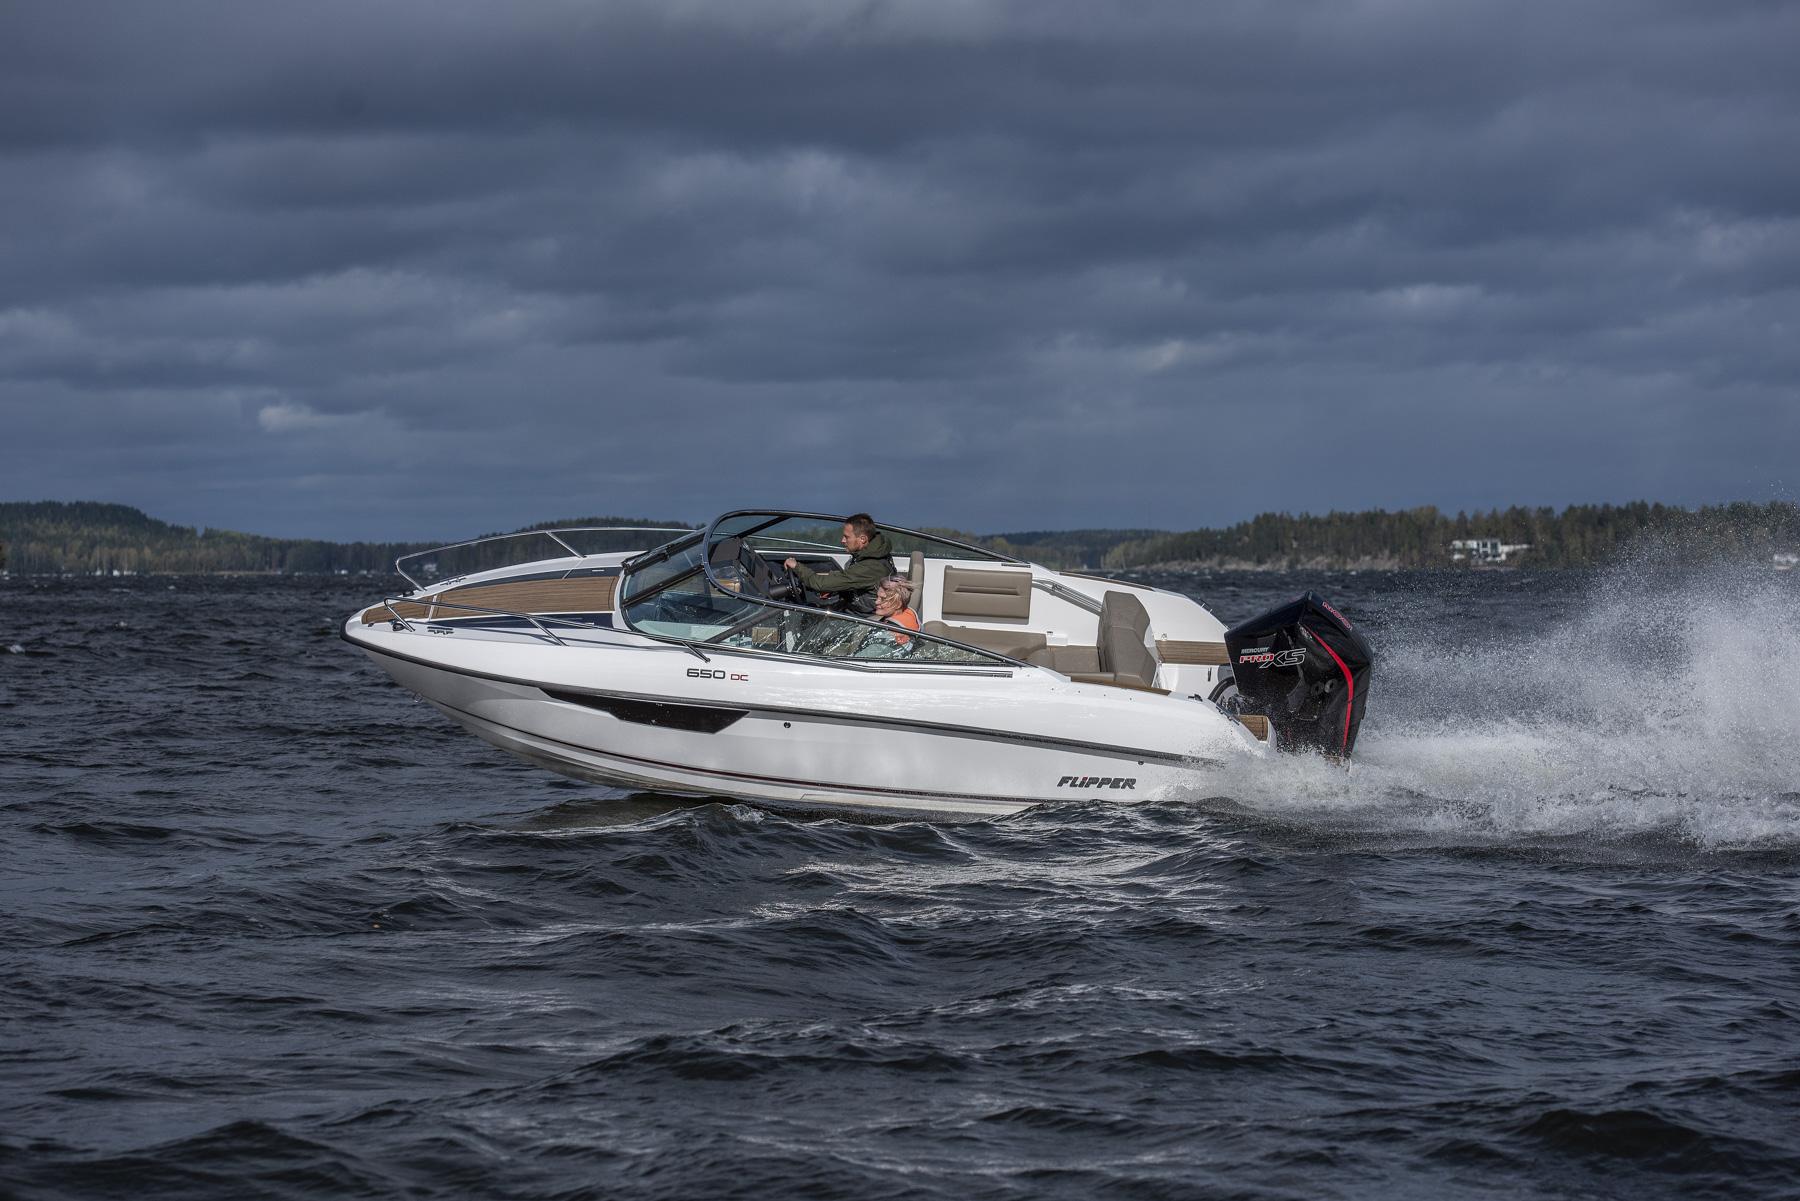 Flipper 650 Day Cruiser port running